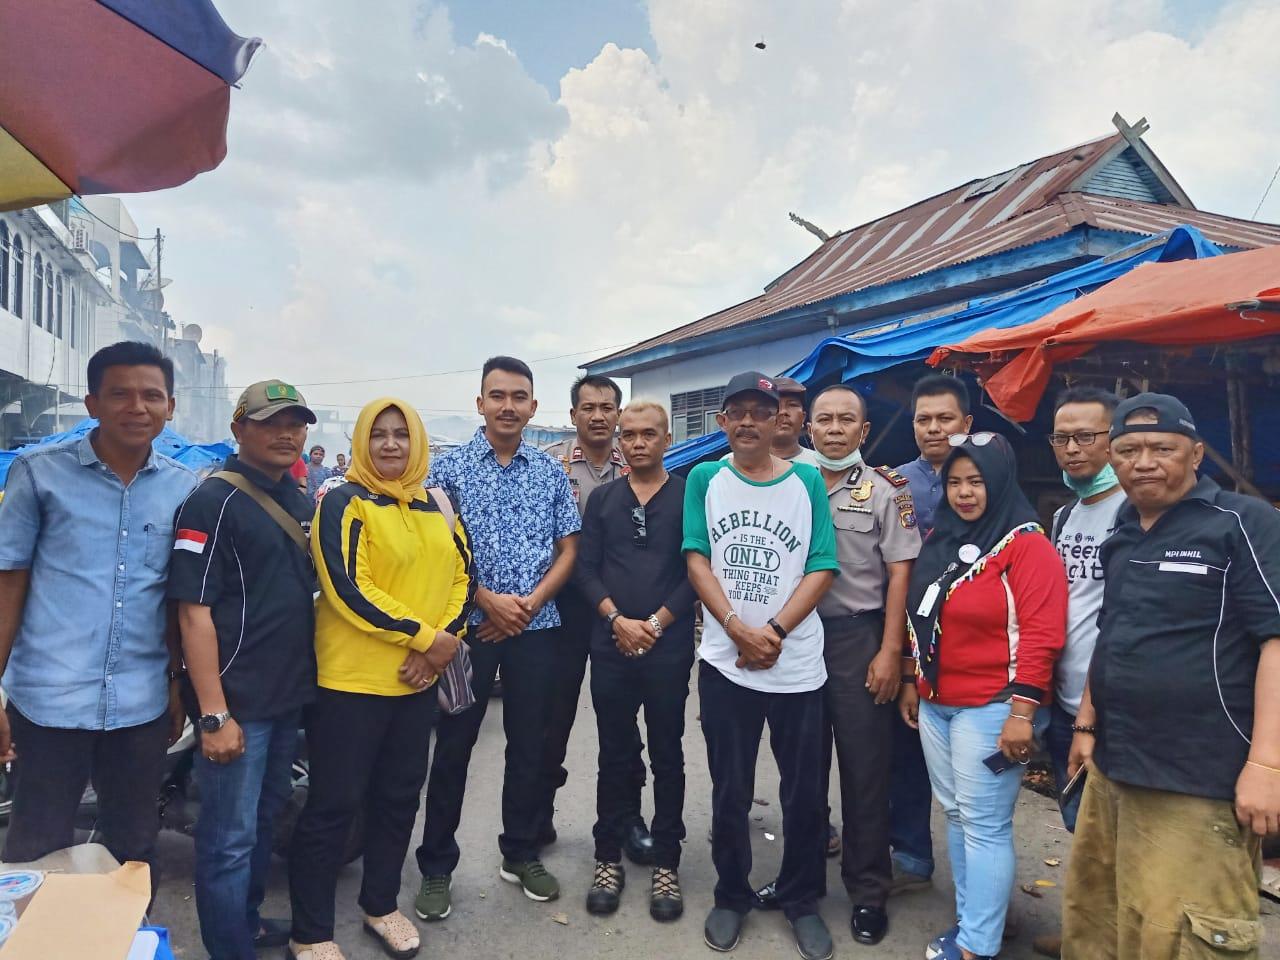 Marlis Syarif Berikan Ratusan Nasi Kotak untuk Korban Kebakaran di Pasar Terapung